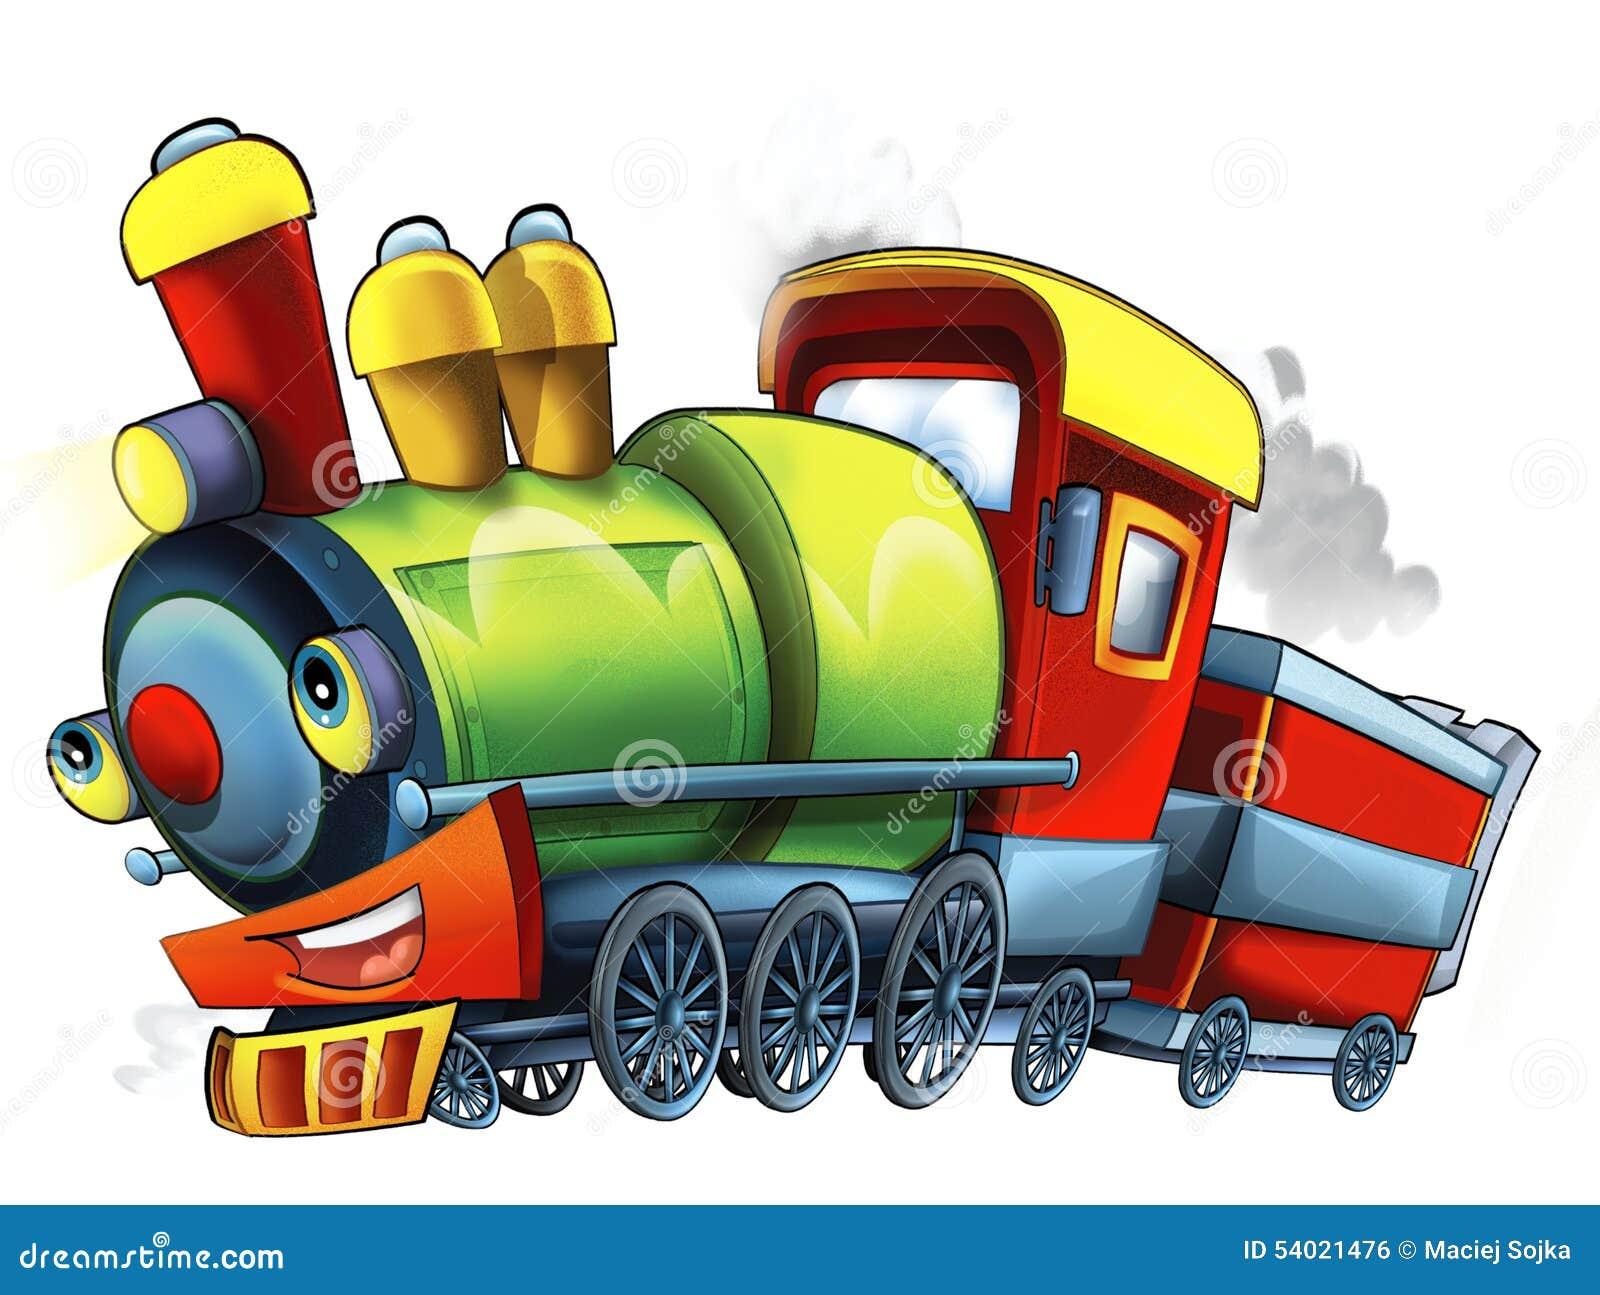 Cartoon steam train caricature illustration for the